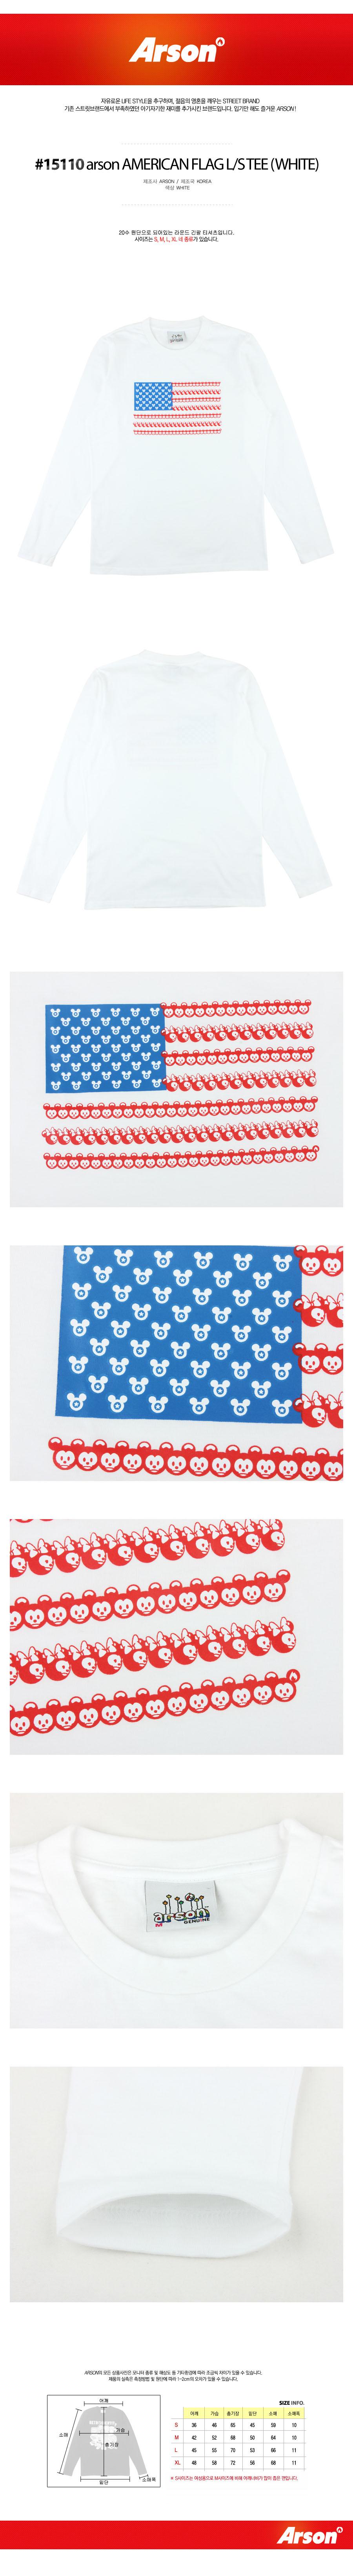 [ ARSON ] [ARSON] 15110 AMERICAN FLAG longsleeved tshirt